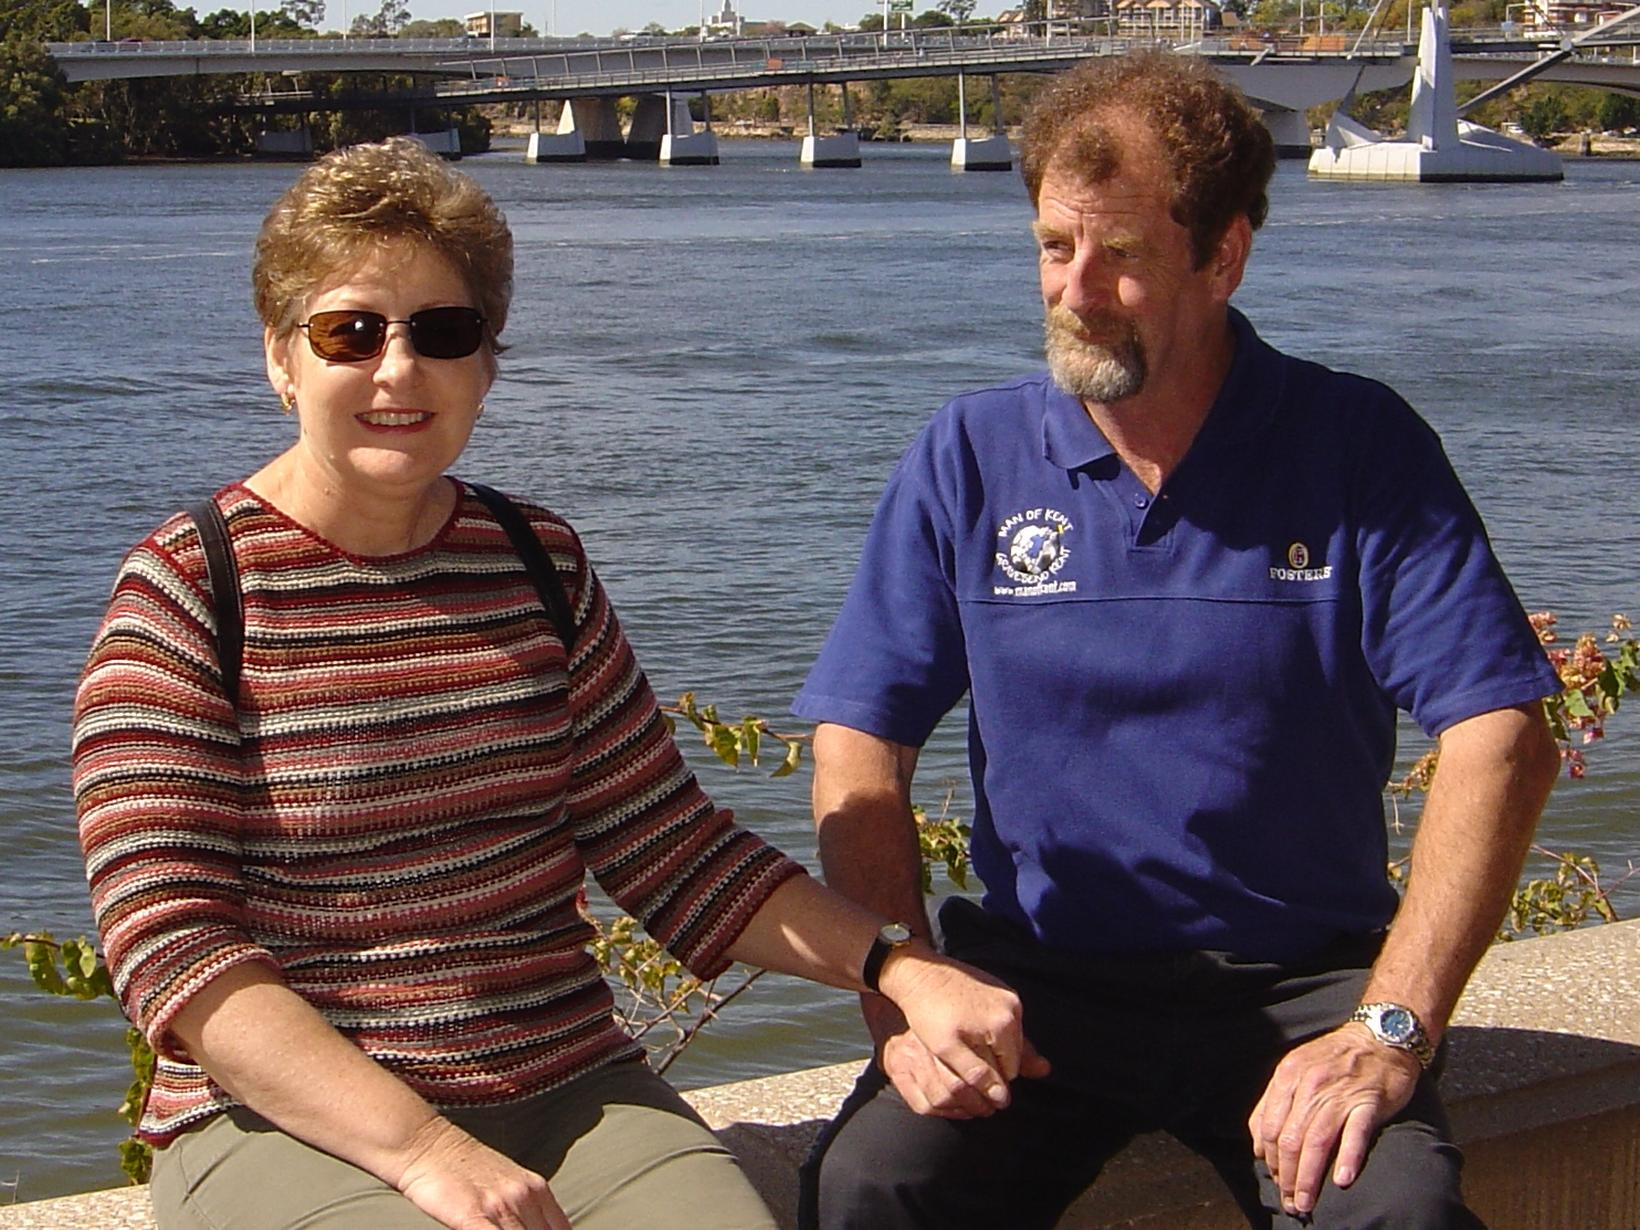 Tricia & James from Launceston, Tasmania, Australia